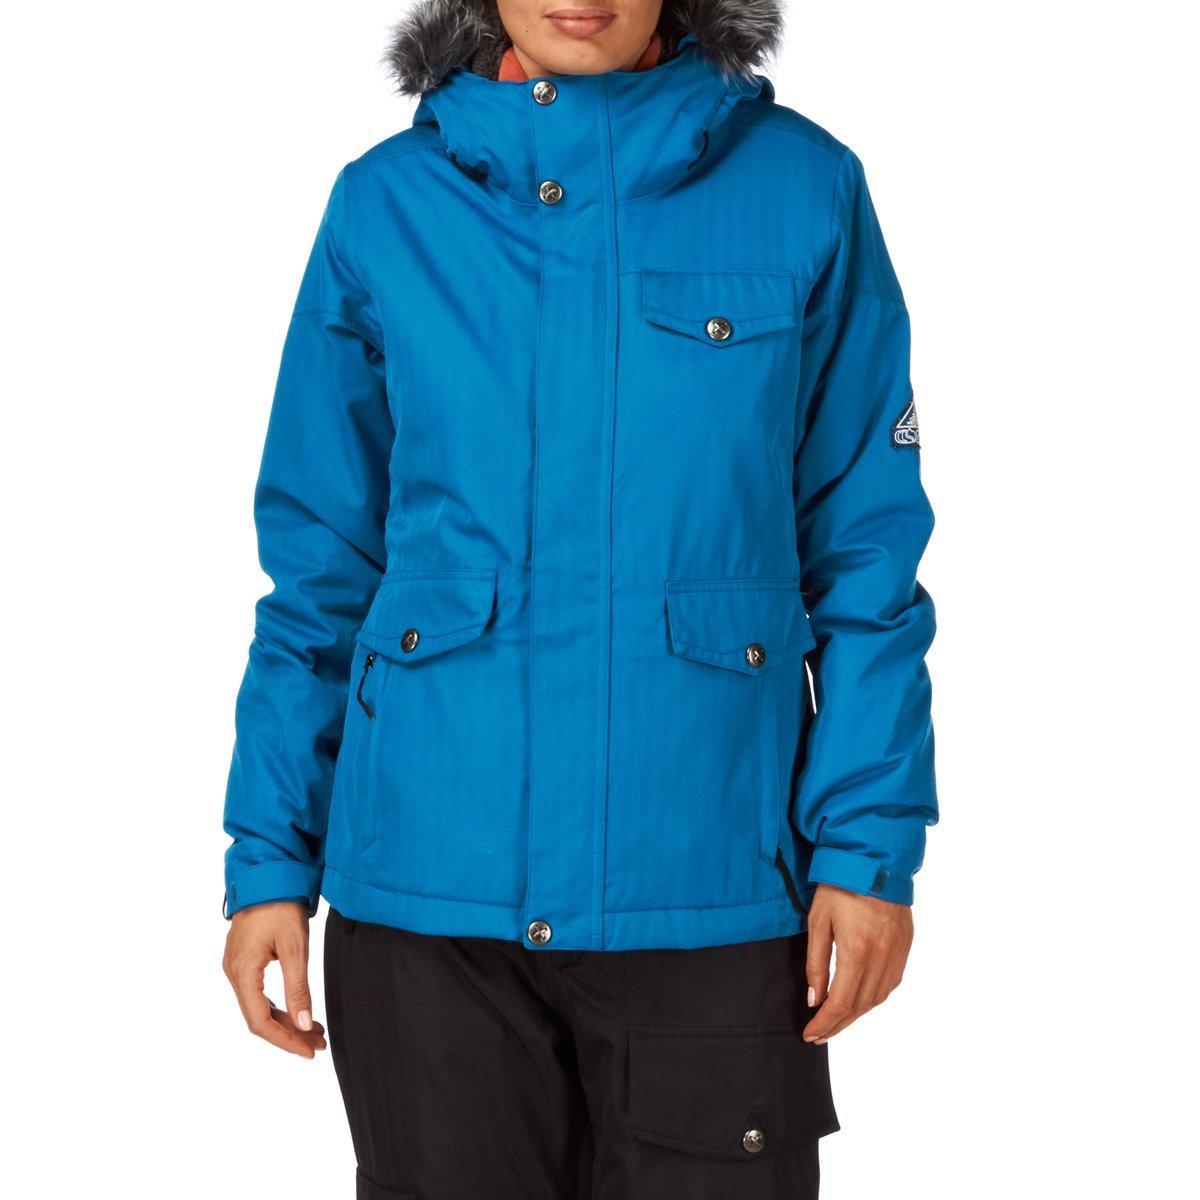 Damen Snowboard Jacke Bonfire Madison Solid Jacket online kaufen